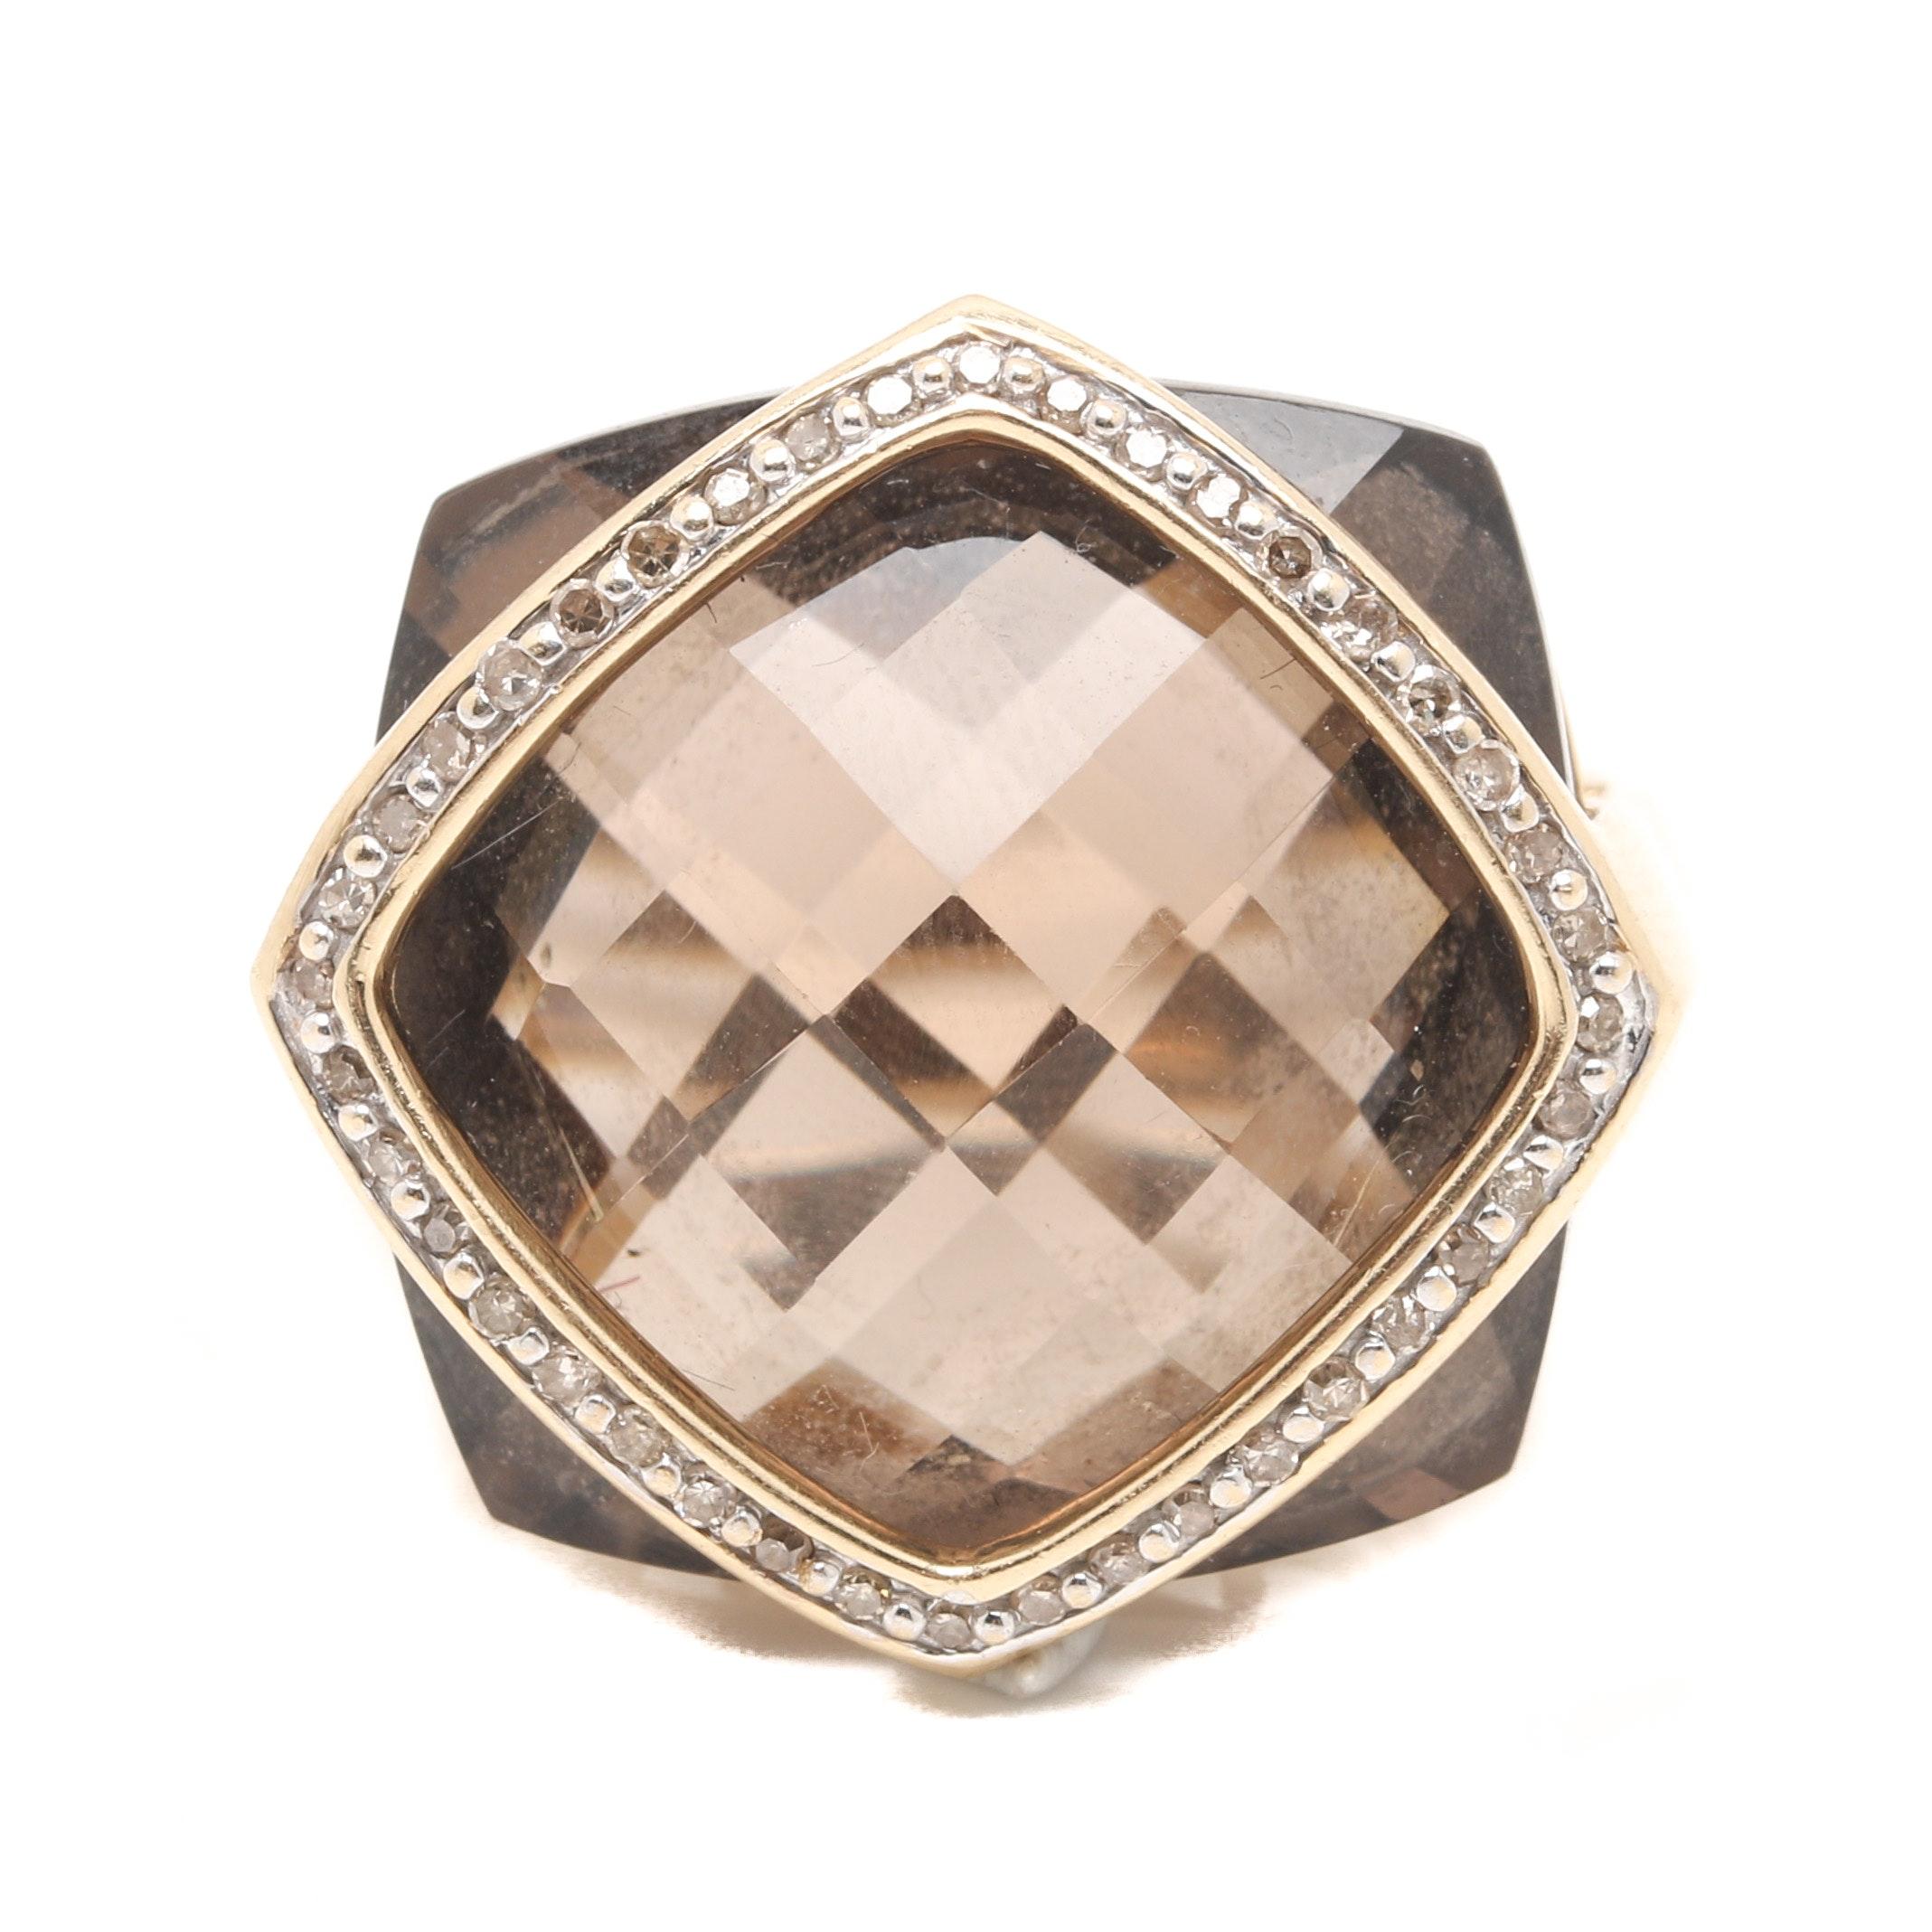 14K Yellow Gold 23.36 CT Smoky Quartz and Diamond Ring